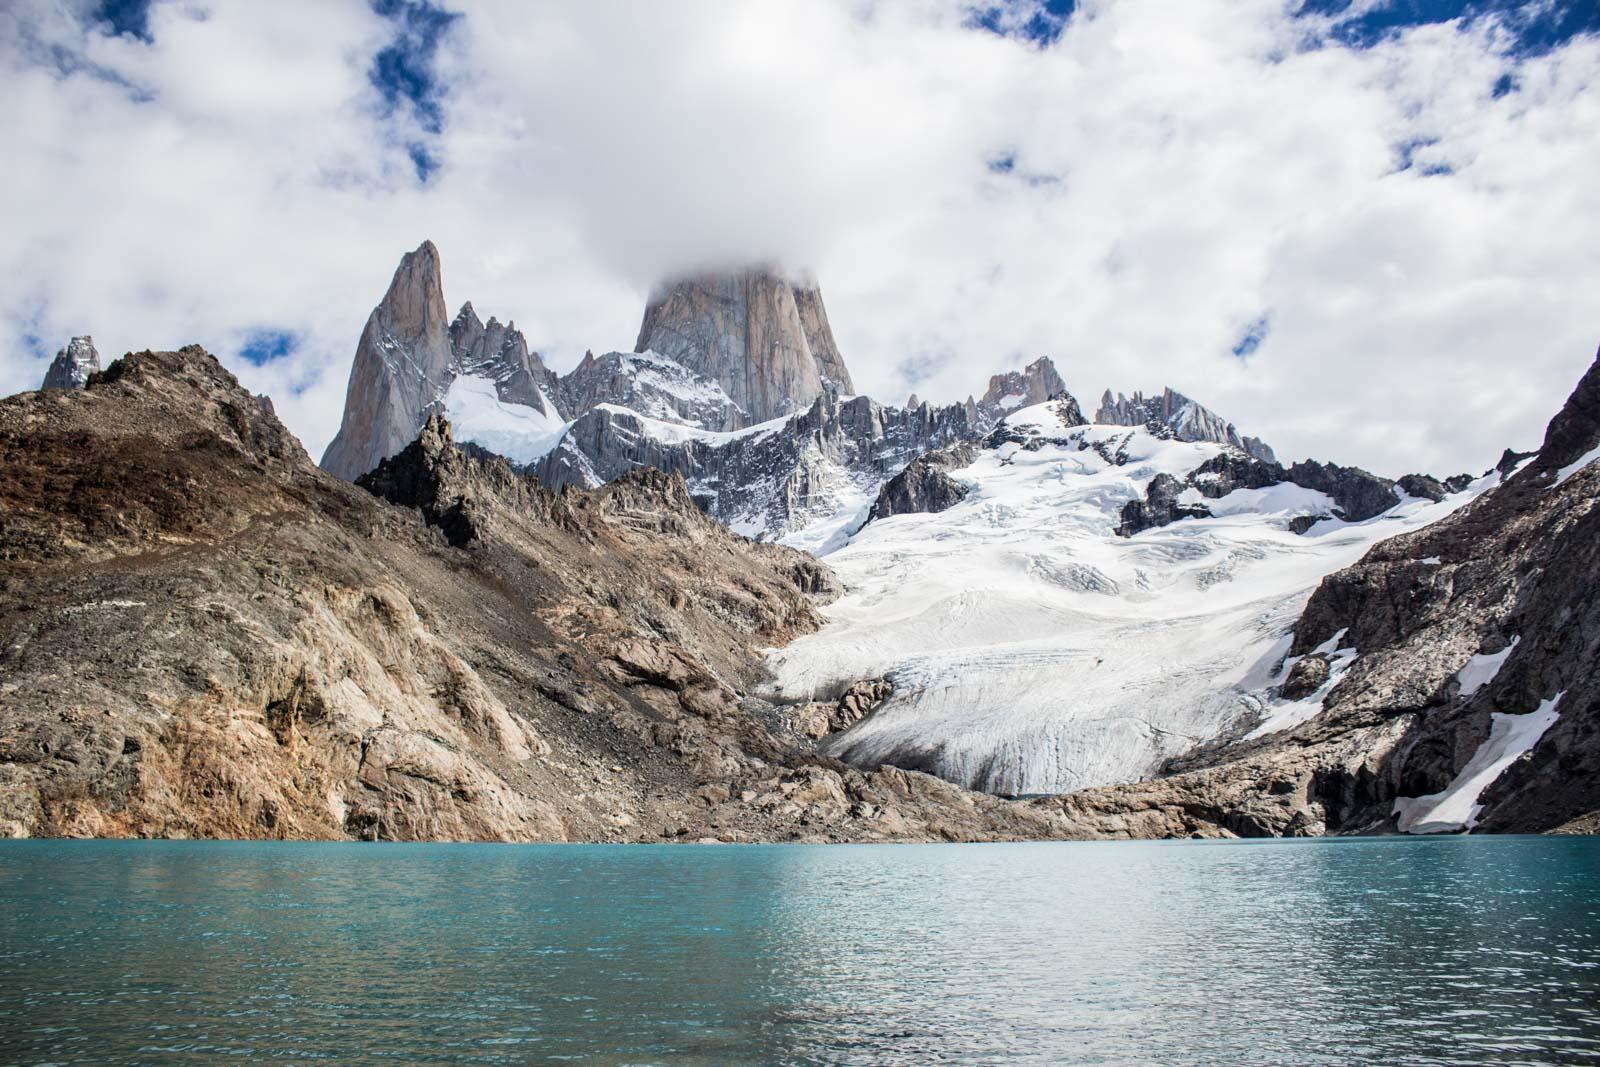 Mount Fitzroy, El Chalten hiking, Patagonia, Argentina